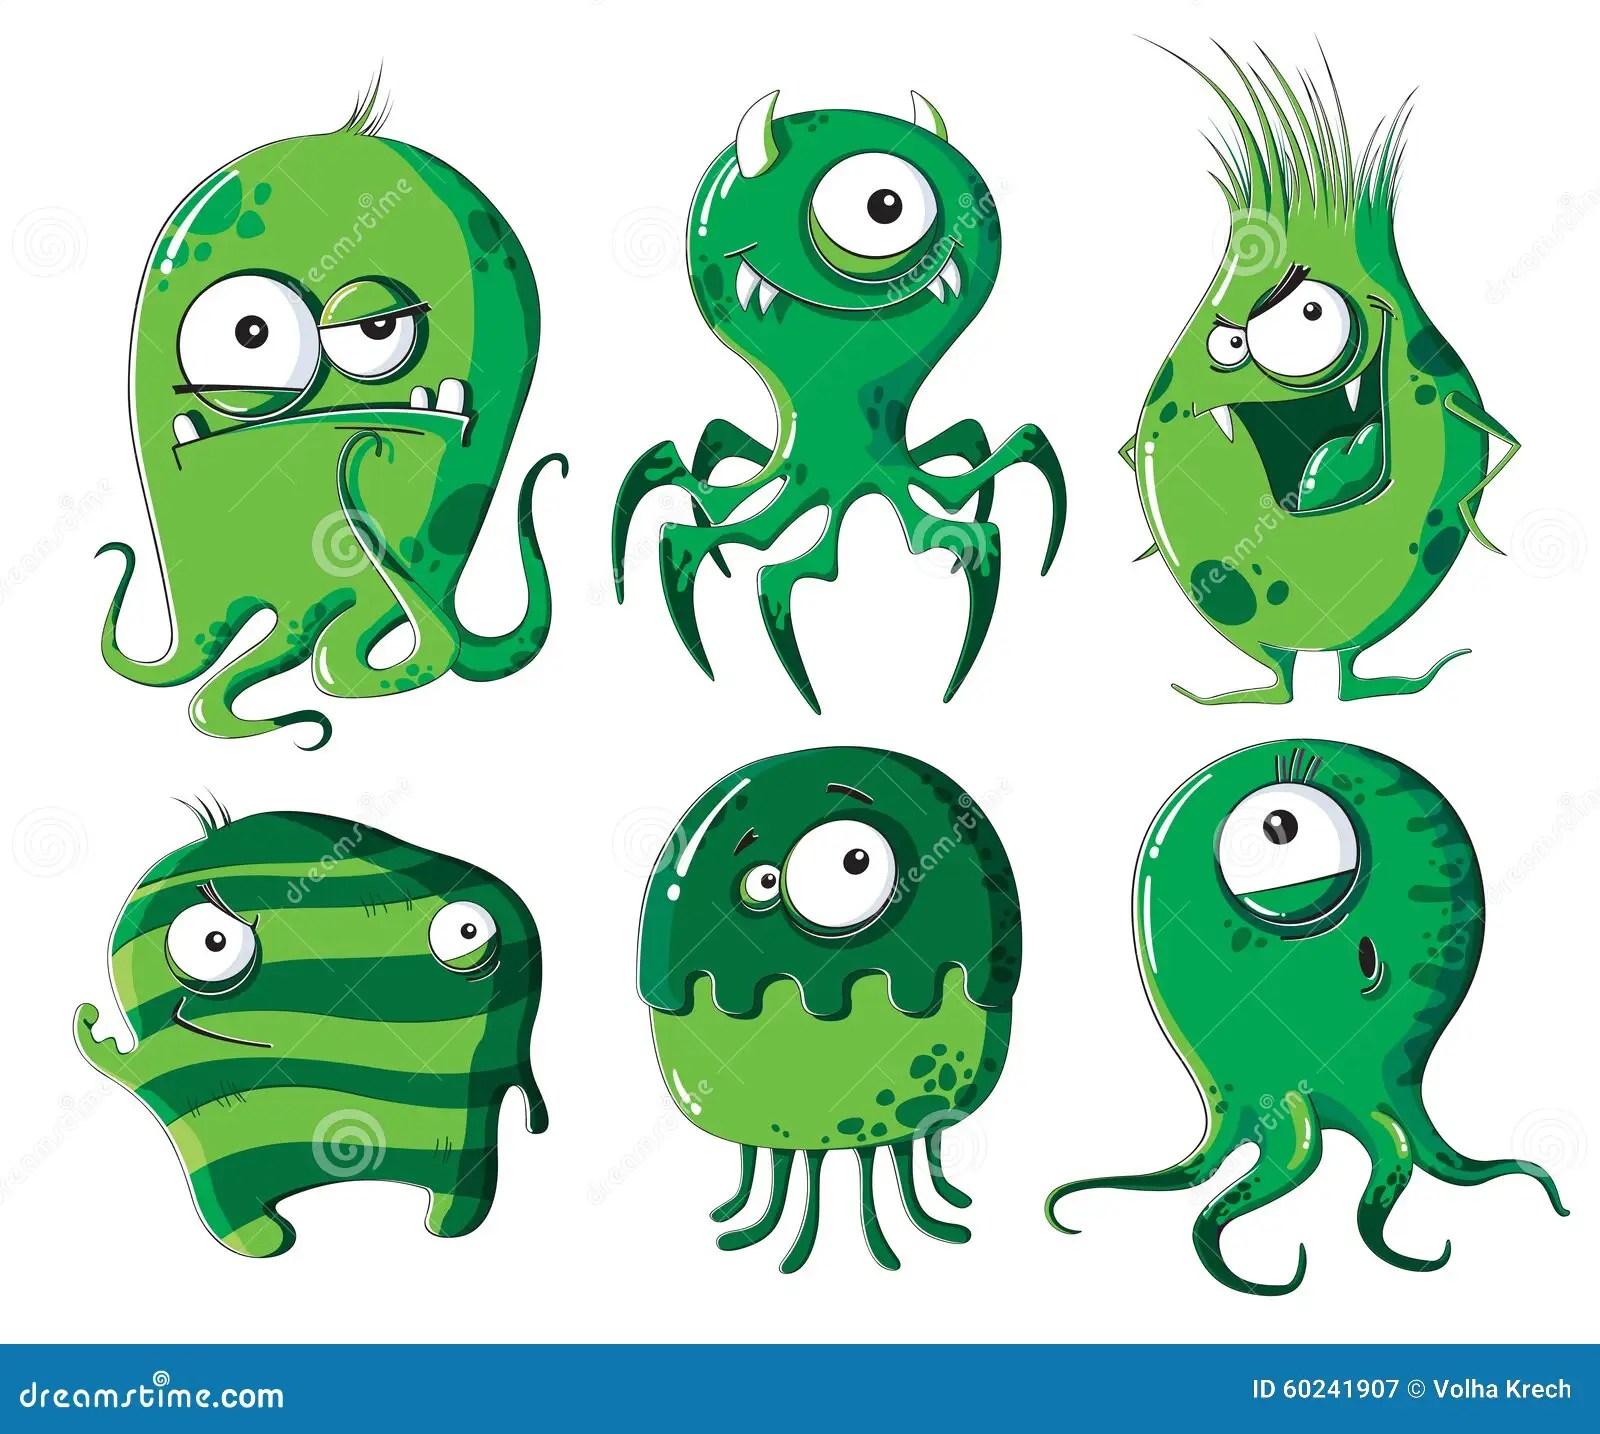 Cartoon Microbes And Bacteria Stock Vector